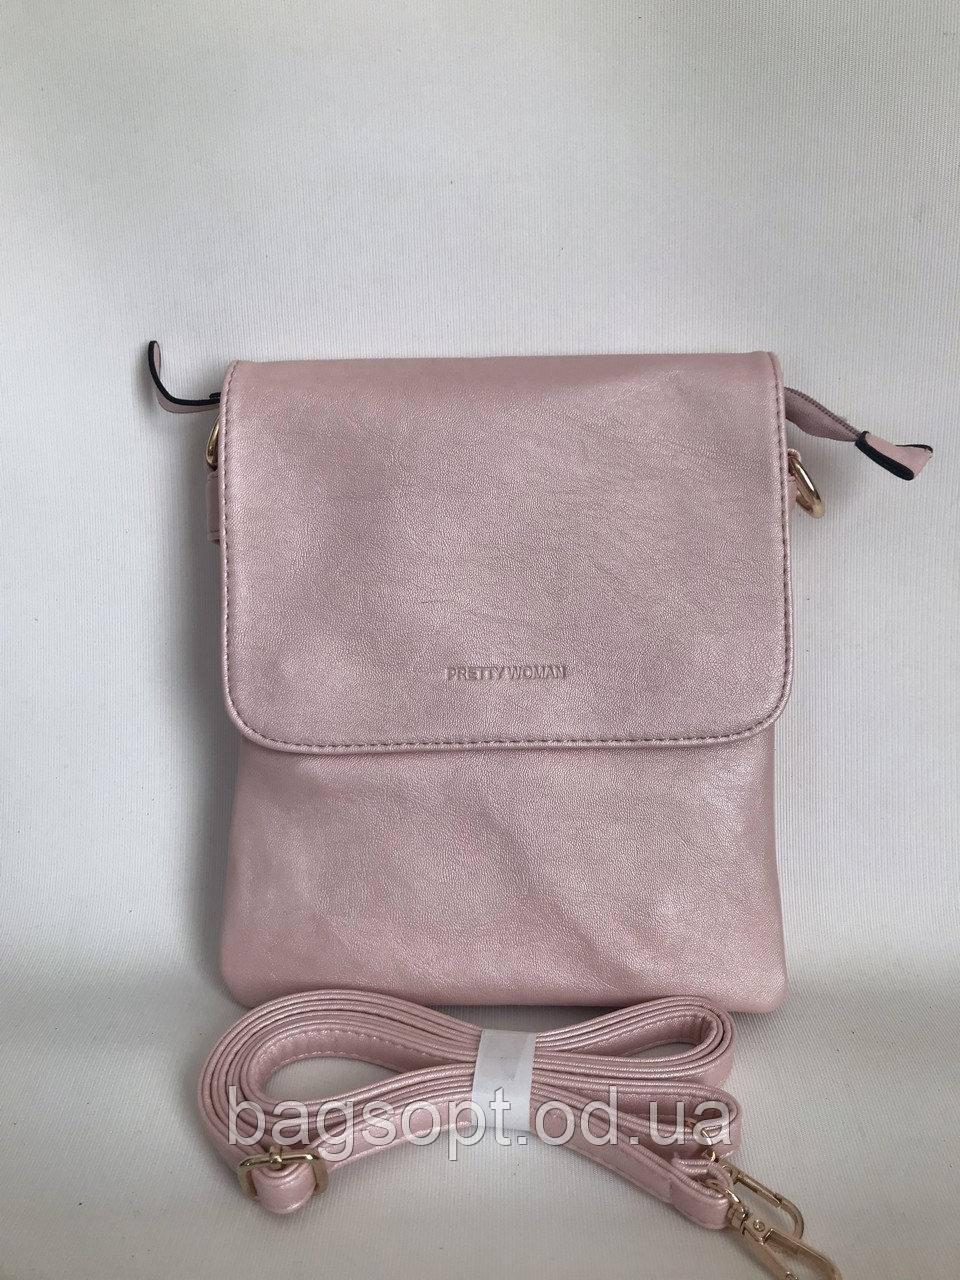 Летняя розовая сумка-планшет через плечо Pretty Woman Одесса 7 км